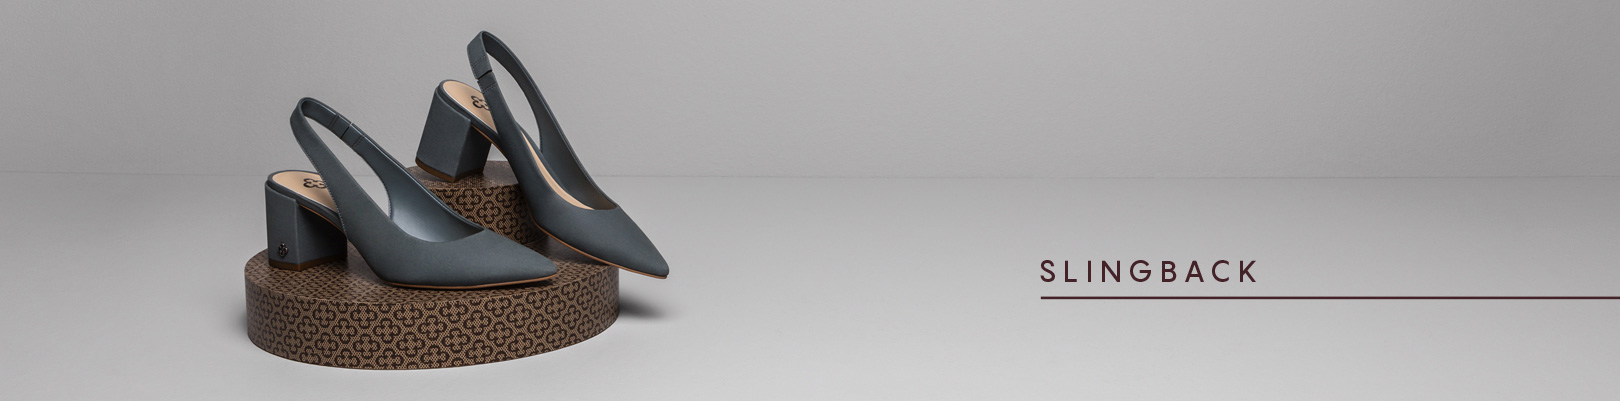 Slingback